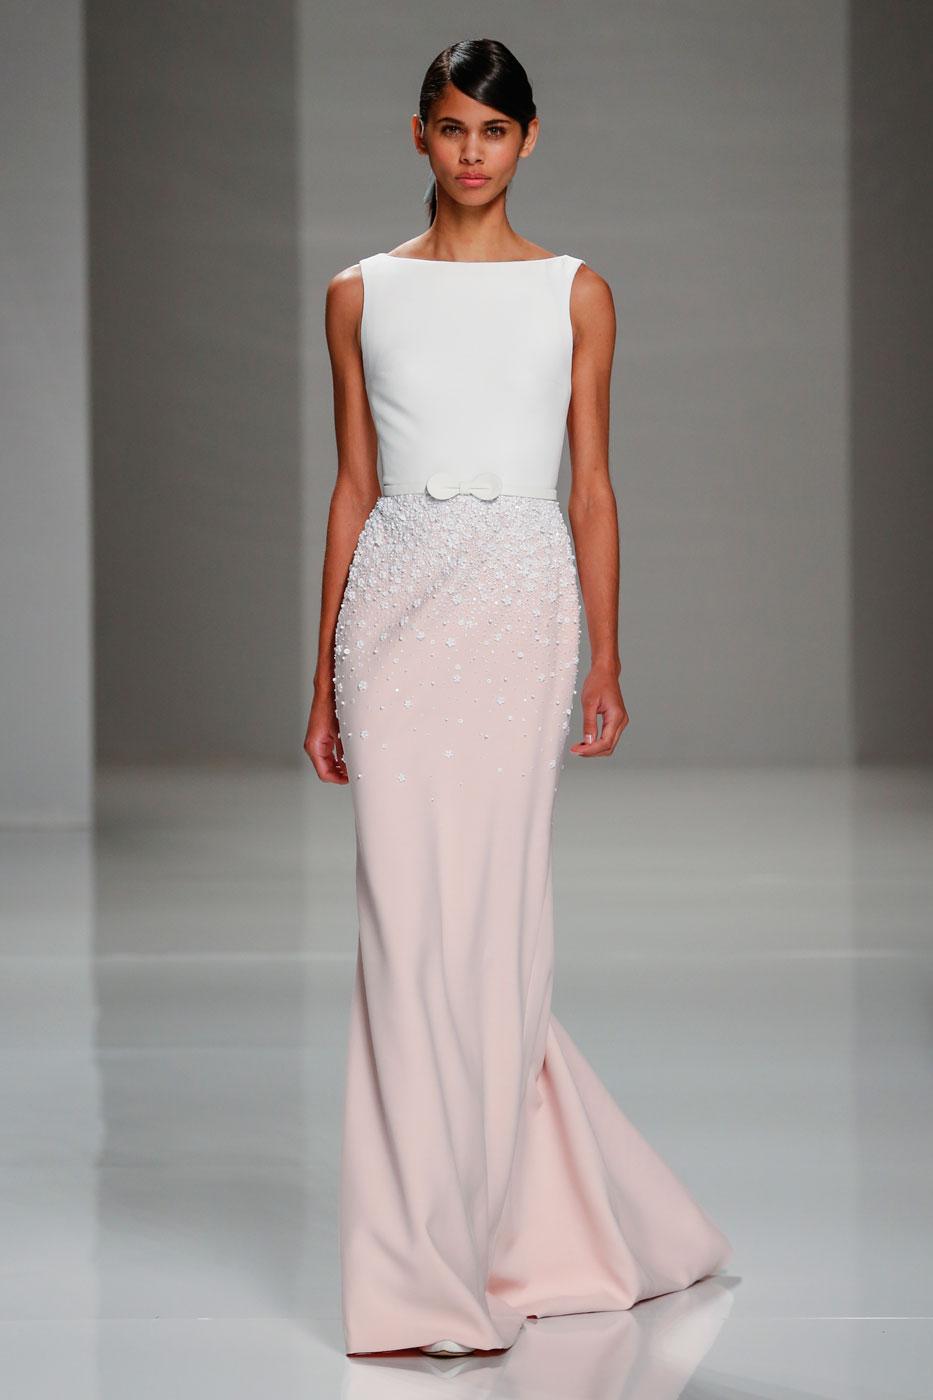 Georges-Hobeika-fashion-runway-show-haute-couture-paris-spring-2015-the-impression-71